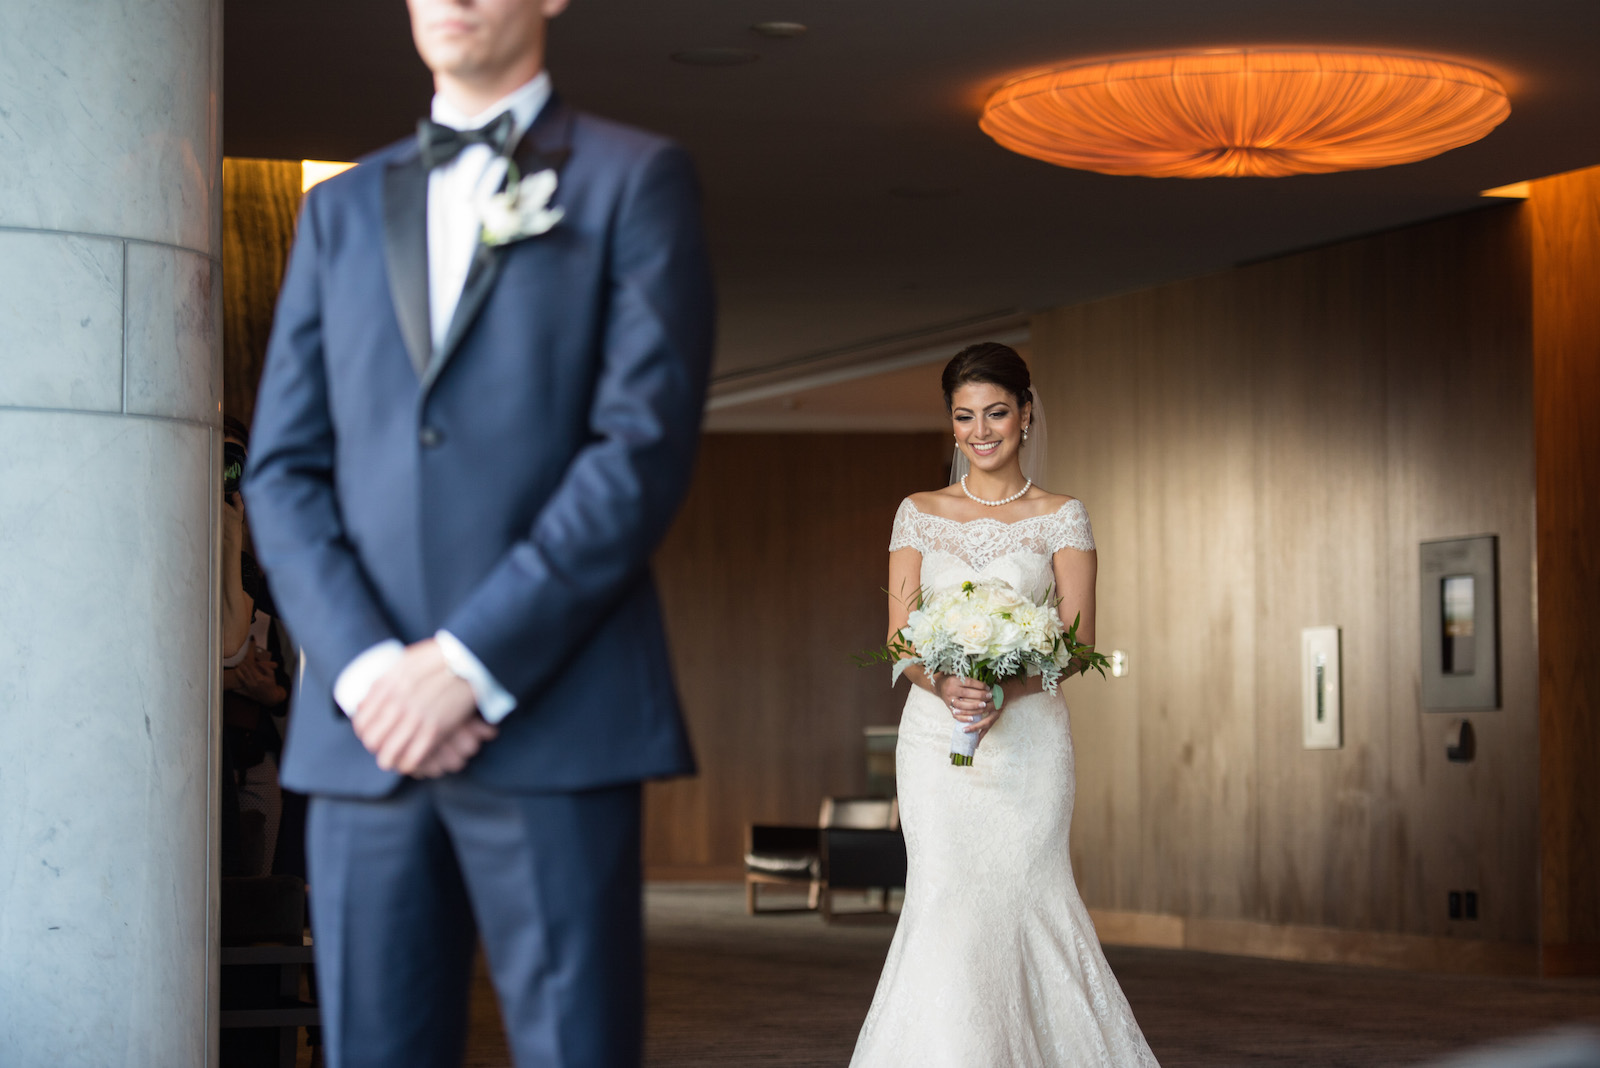 victoria-wedding-photographers-fairmont-pacific-rim-wedding-18.jpg